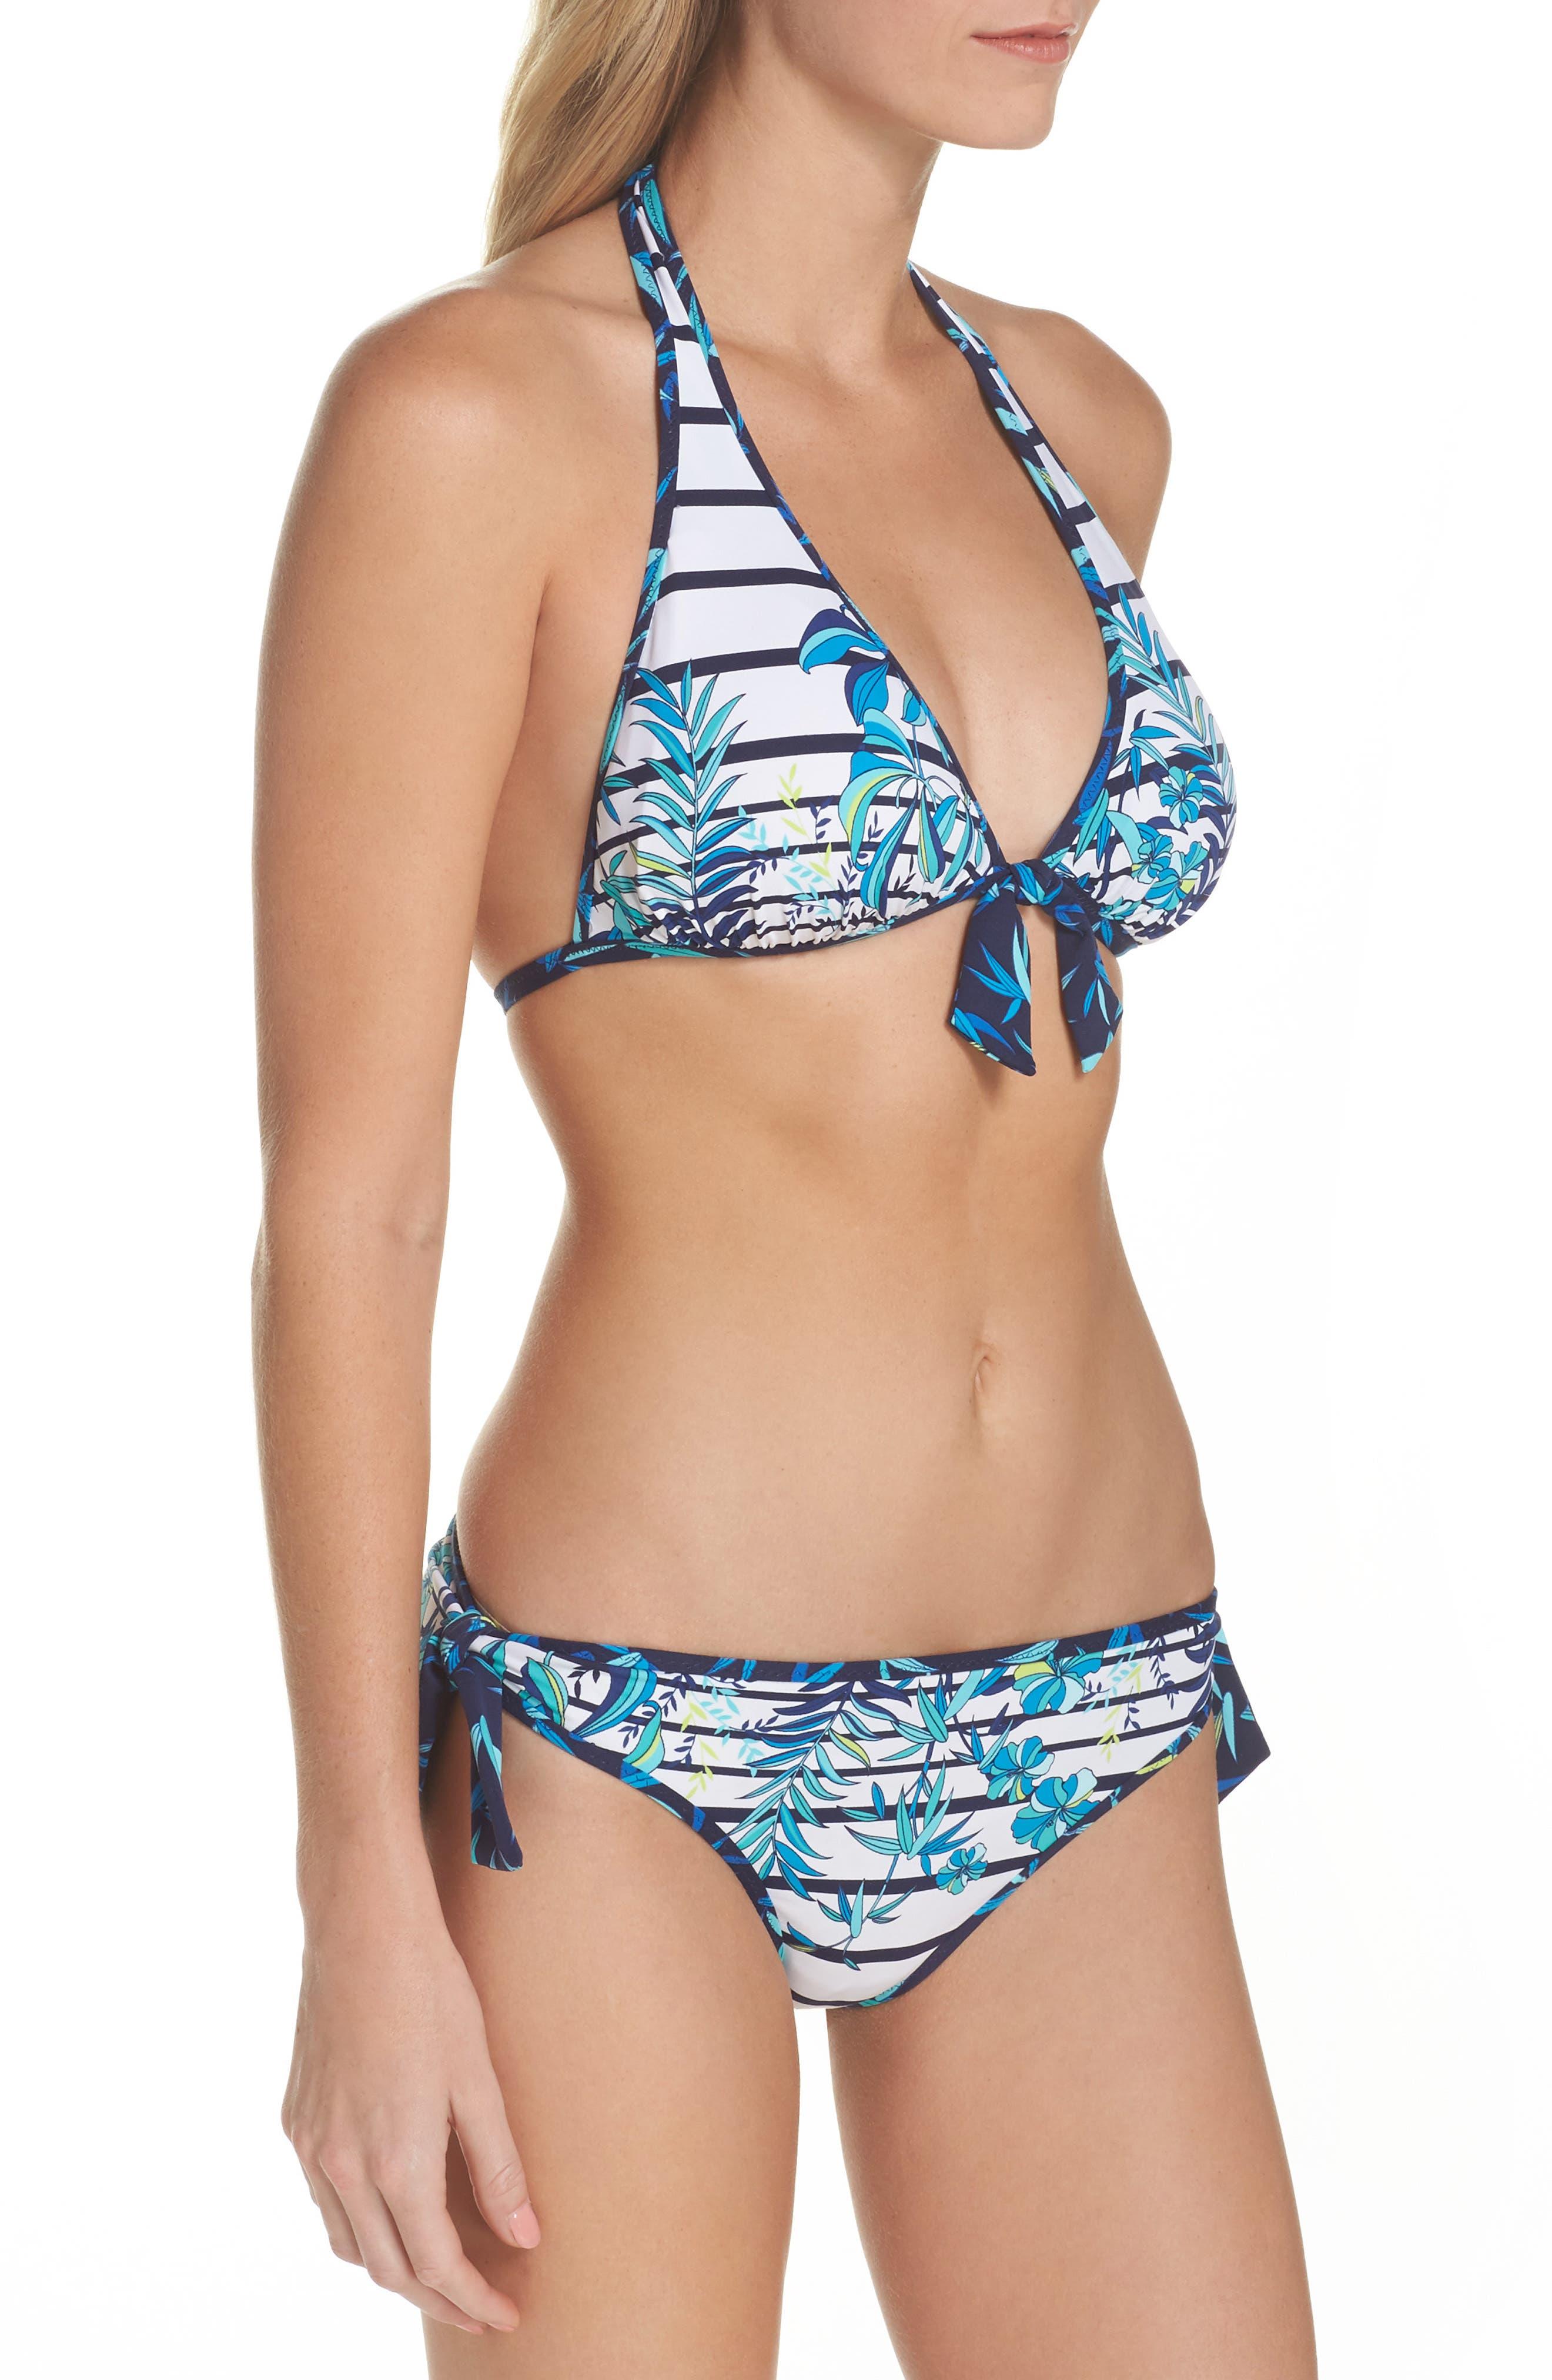 Tropical Swirl Reversible Halter Bikini Top,                             Alternate thumbnail 7, color,                             Blue/ White